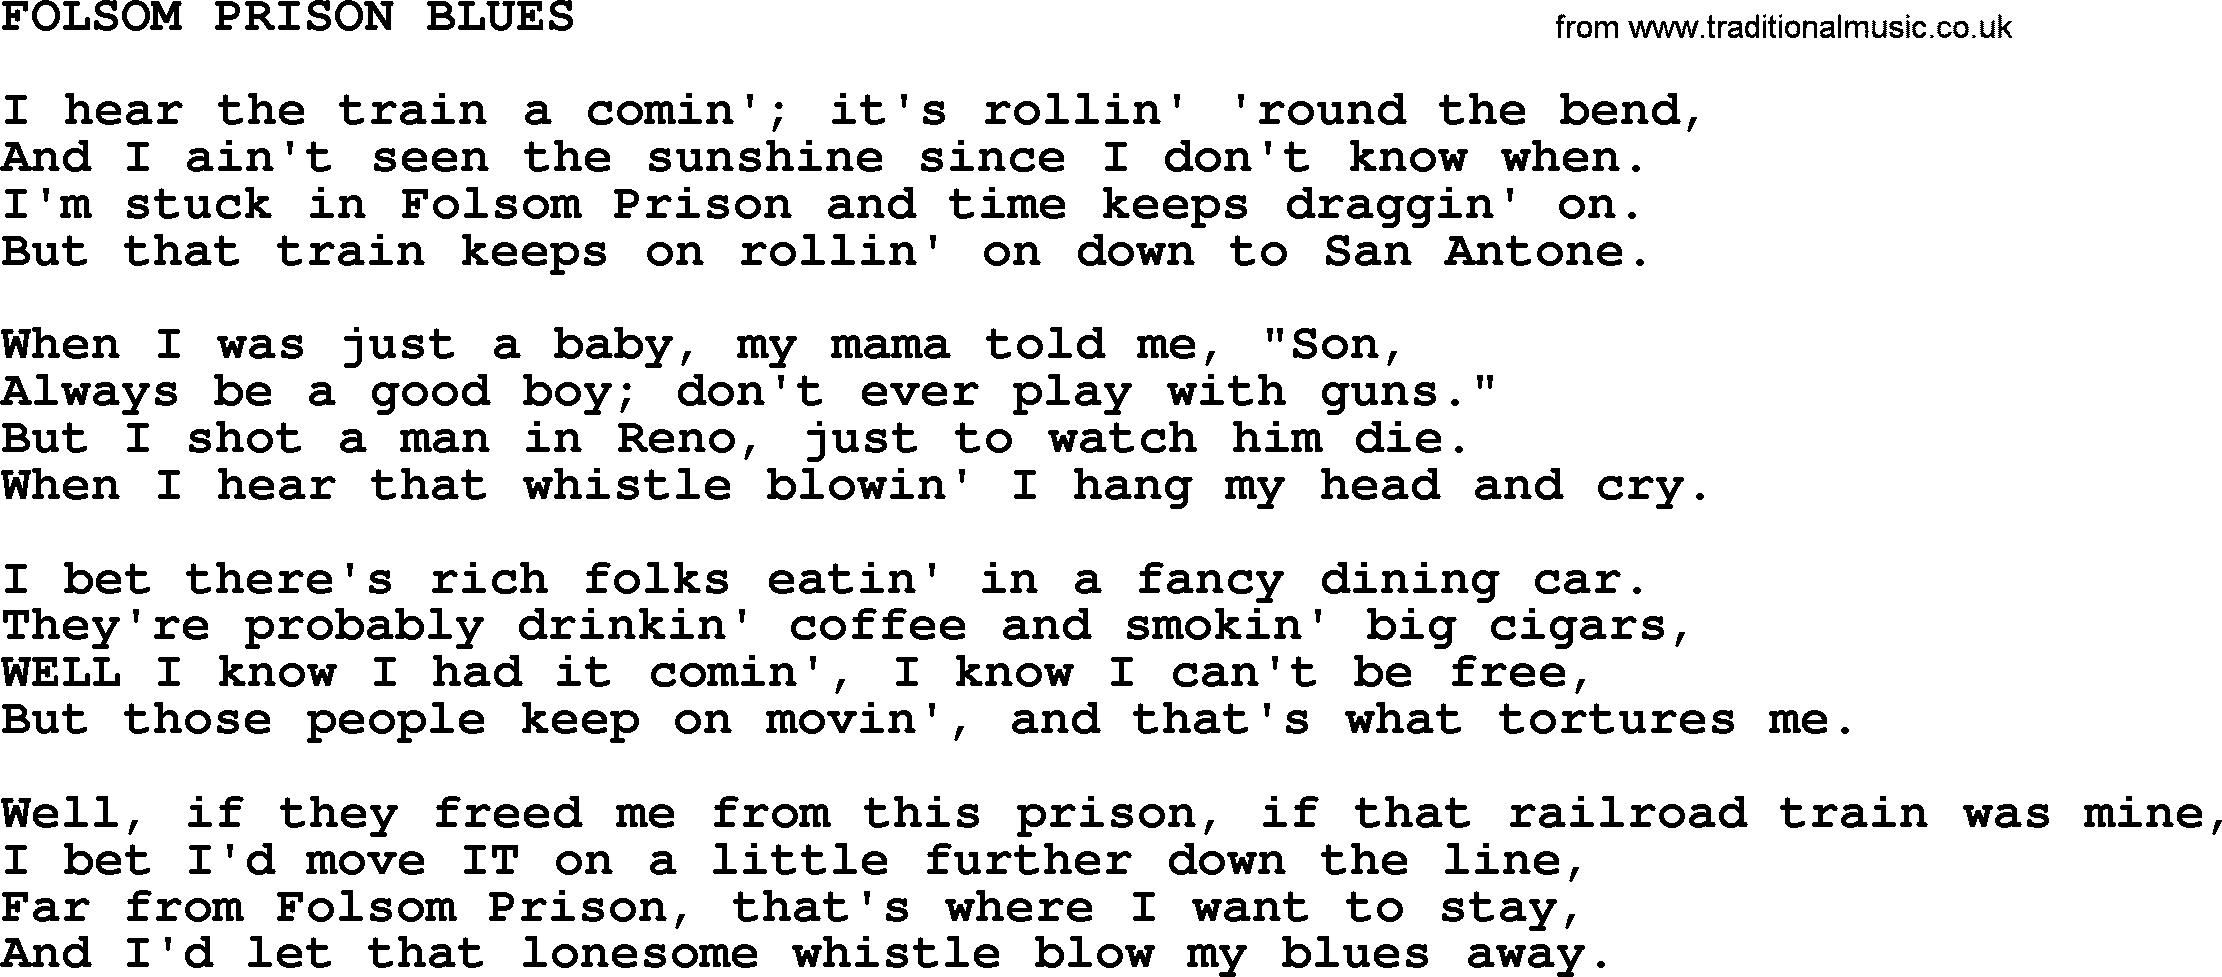 Folsom Prison Blues Chords Johnny Cash Song Folsom Prison Blues Lyrics